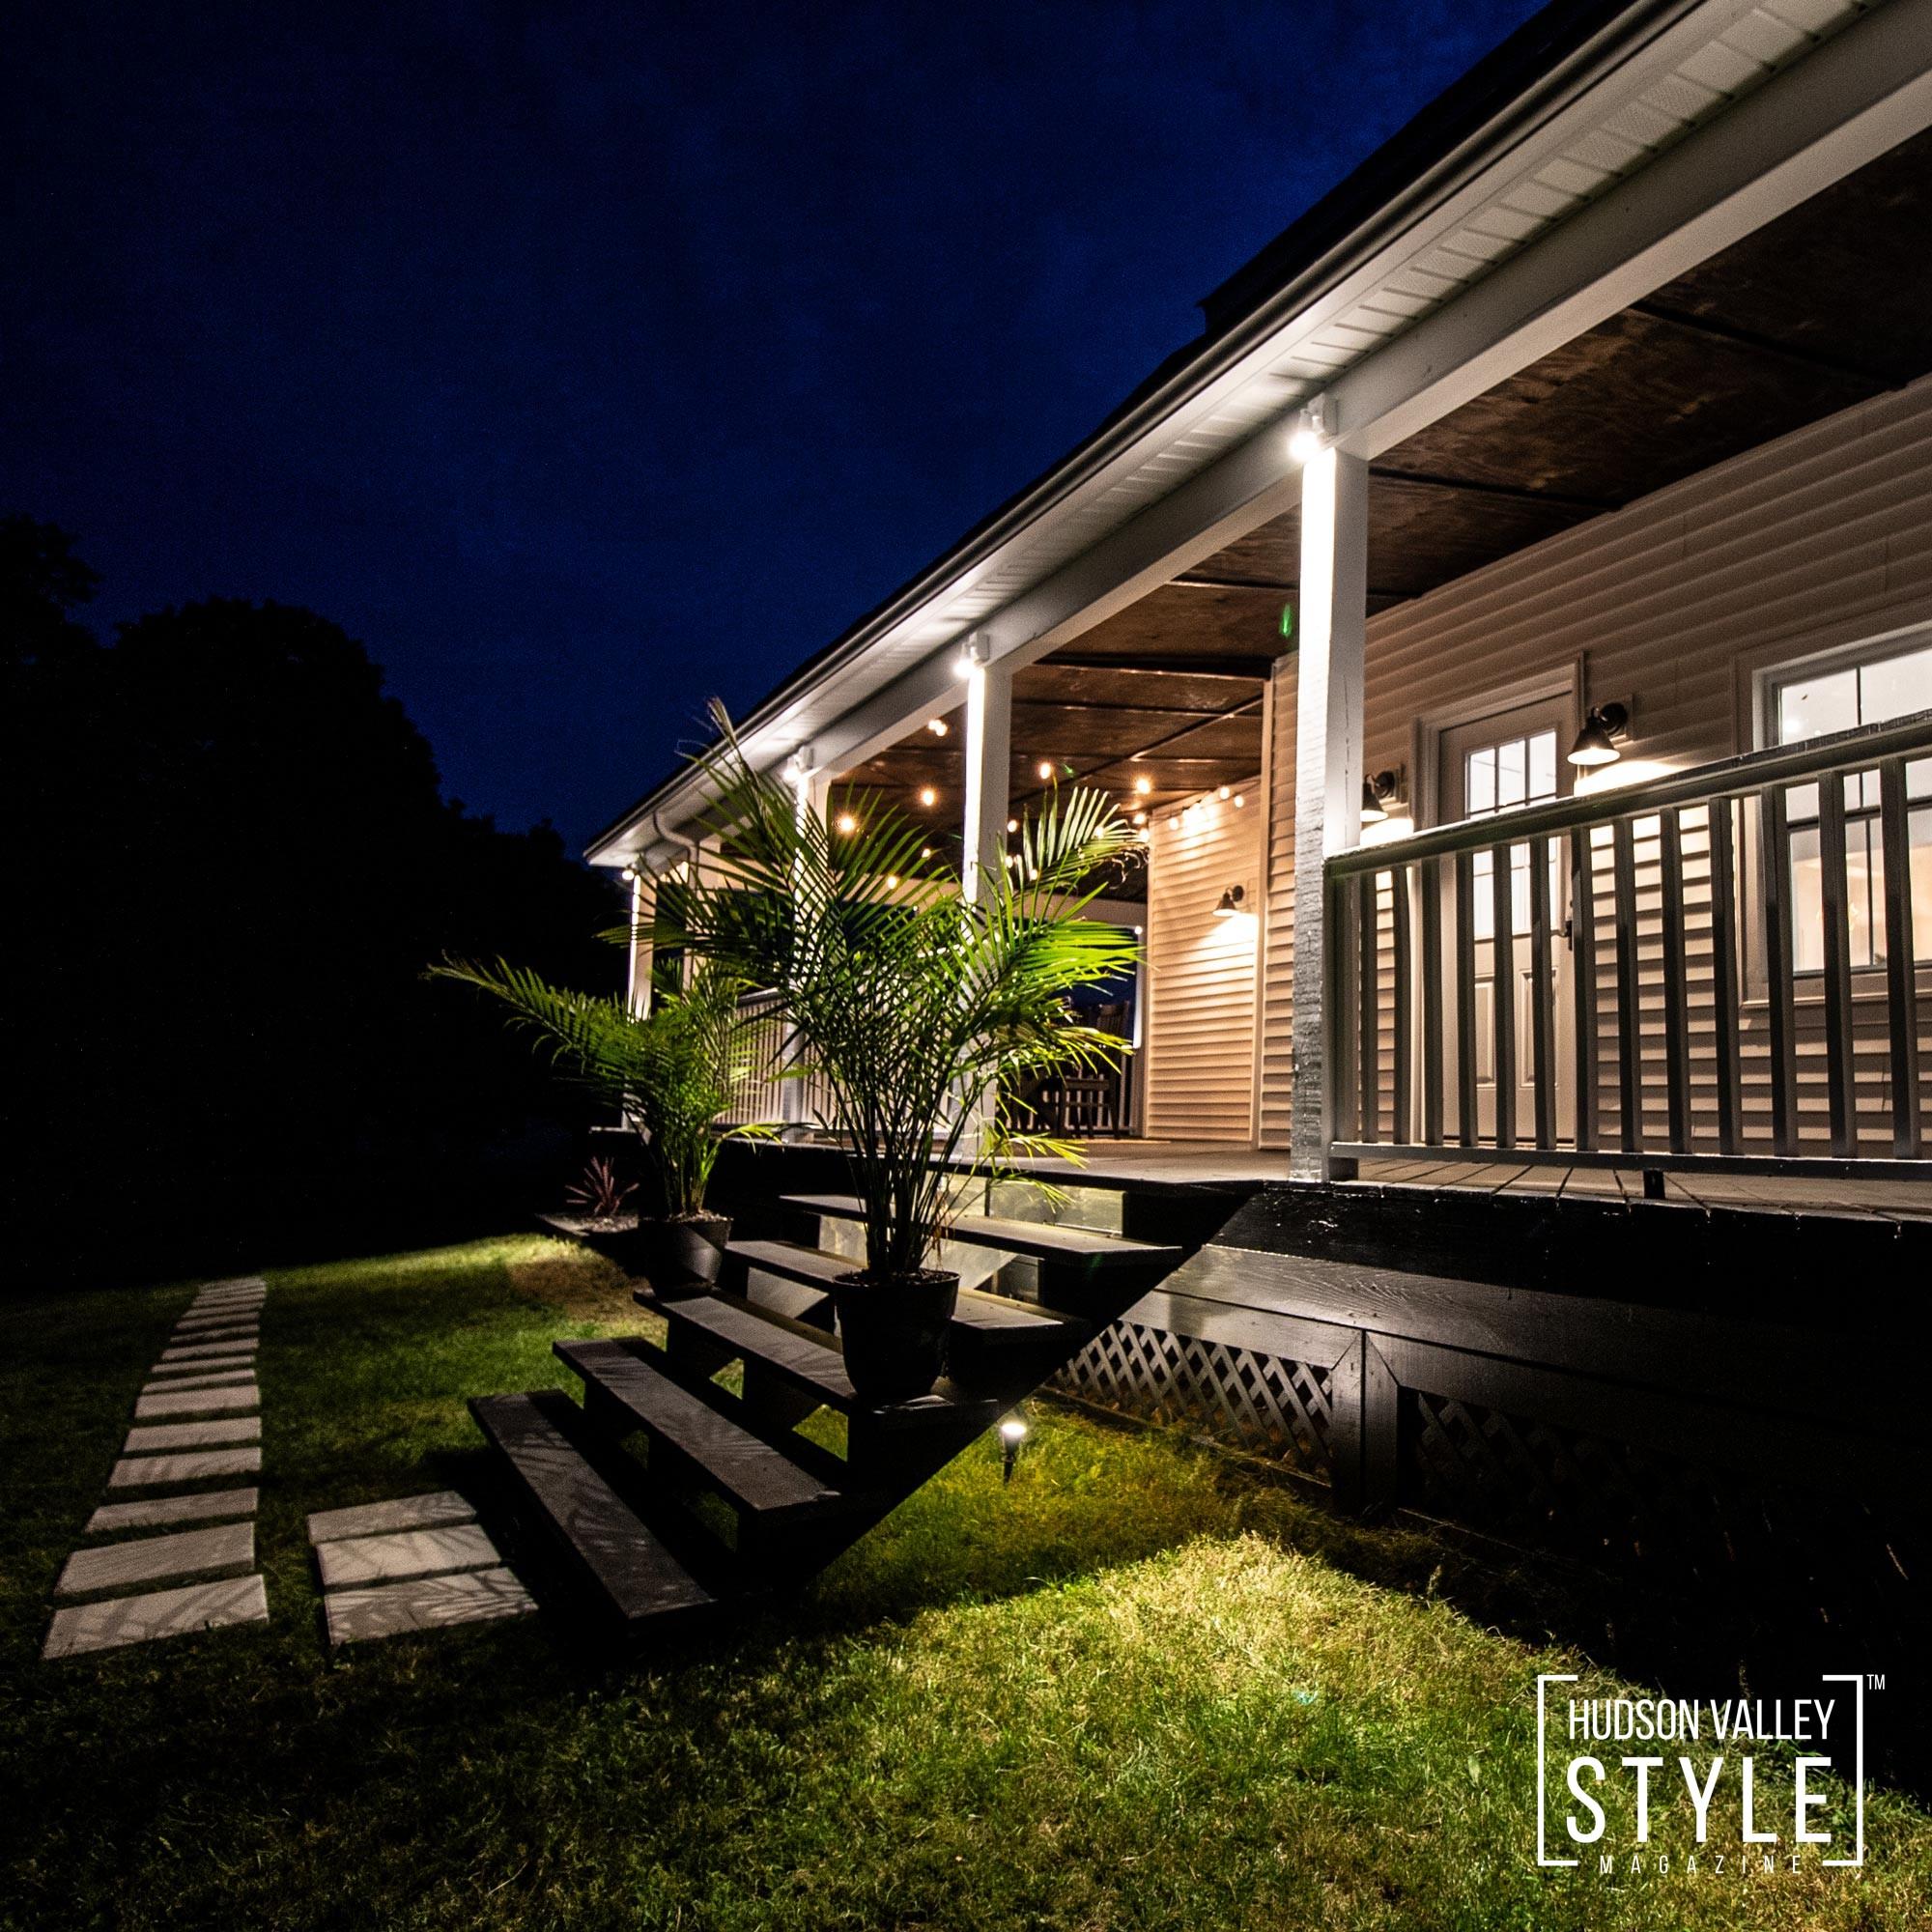 Historic Hudson Valley Farmhouse Reinvented by Duncan Avenue Interior Design Studio